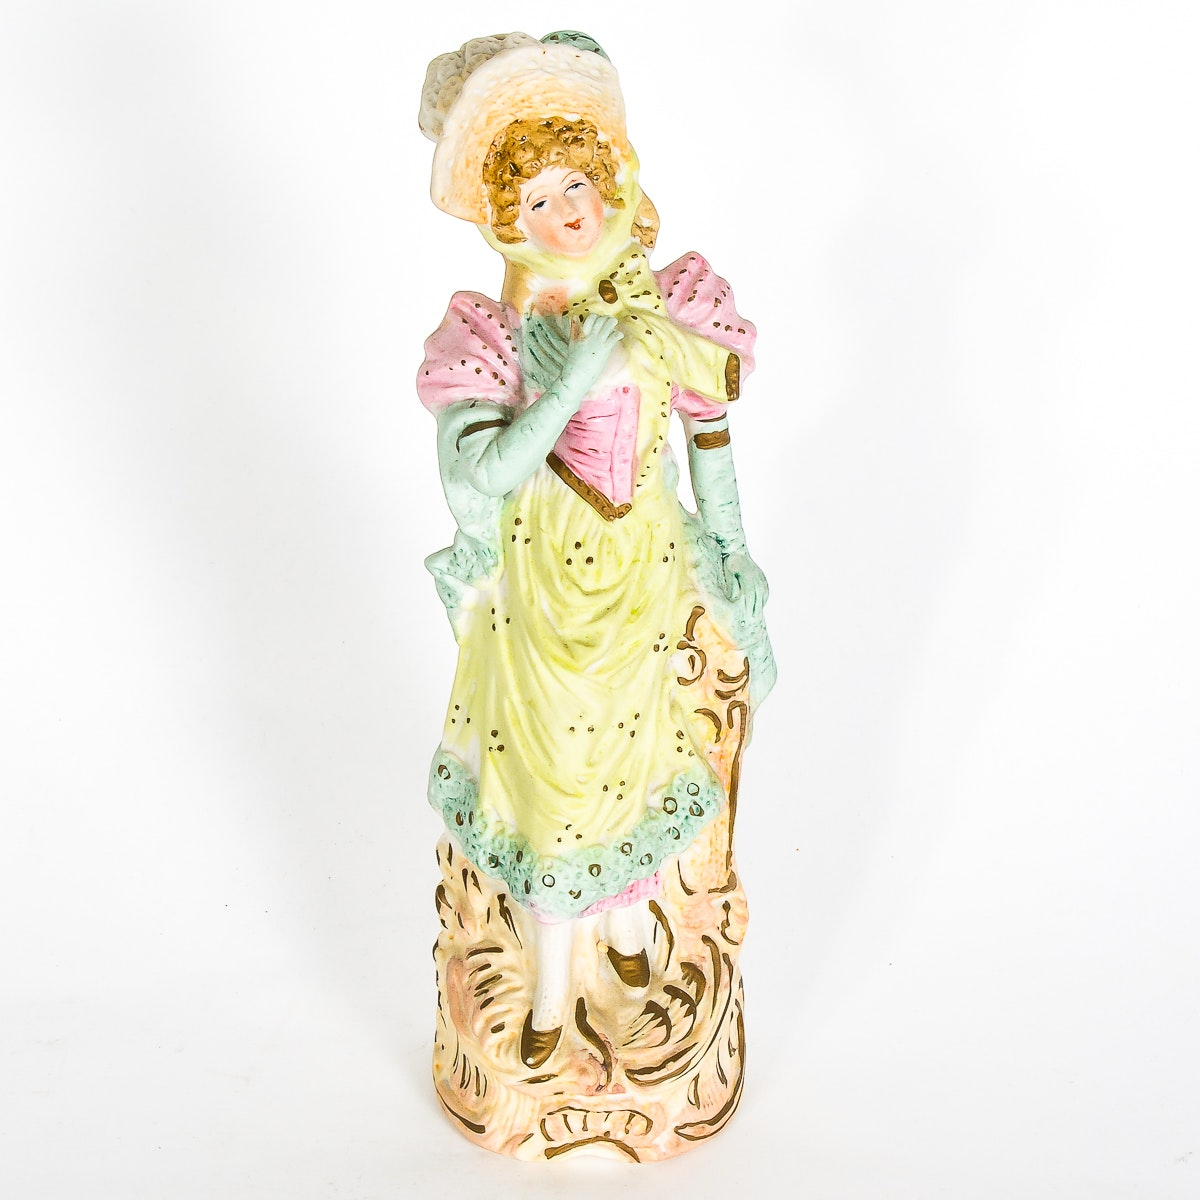 Vintage Japanese Porcelain Figurine